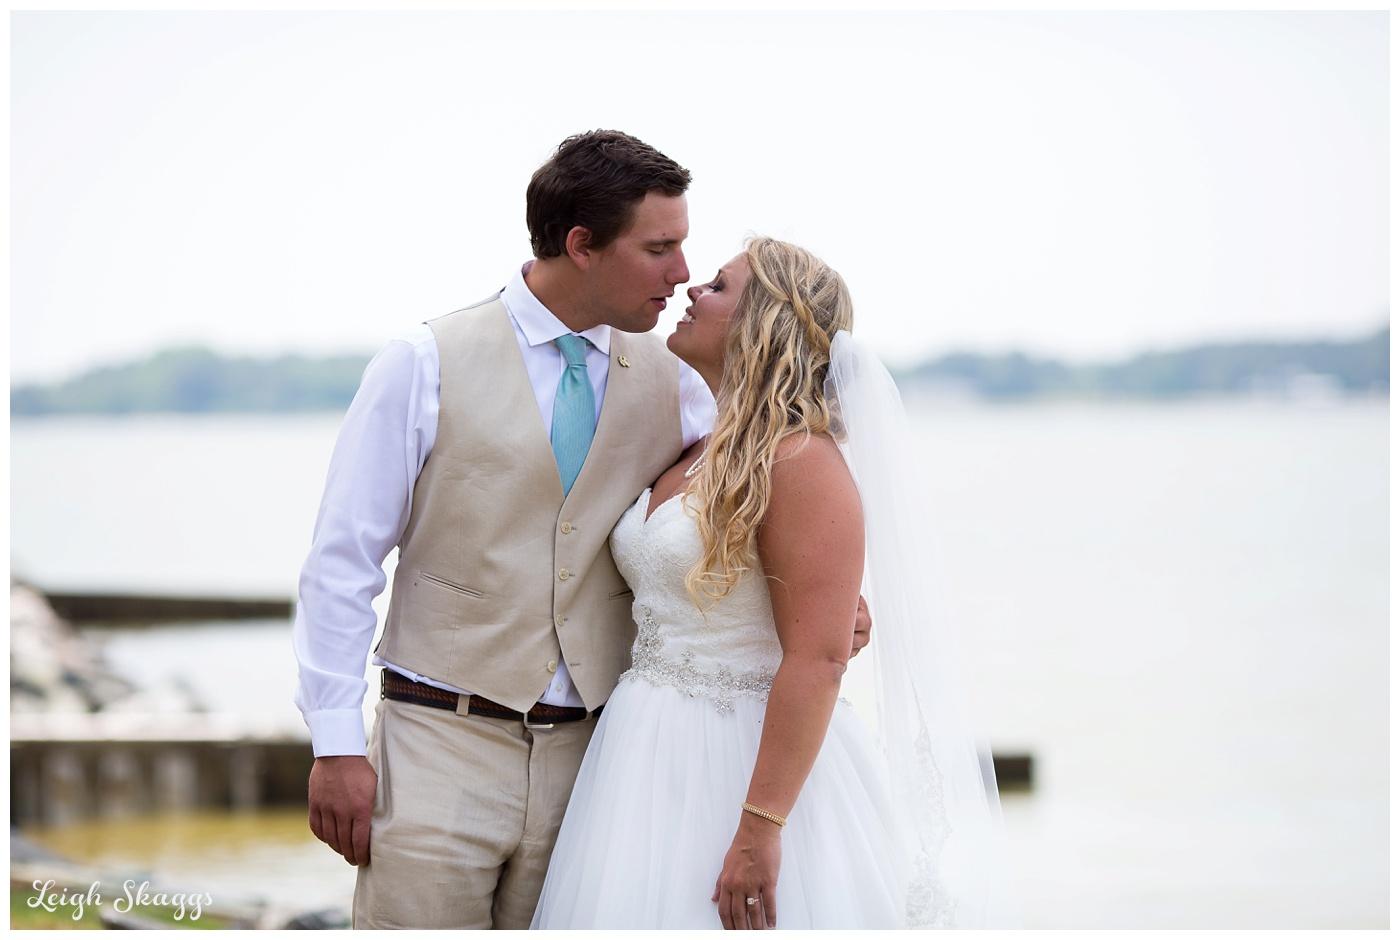 Erin and Jake are Married!  A Sneak Peek from their Gwynns Island Virginia wedding!